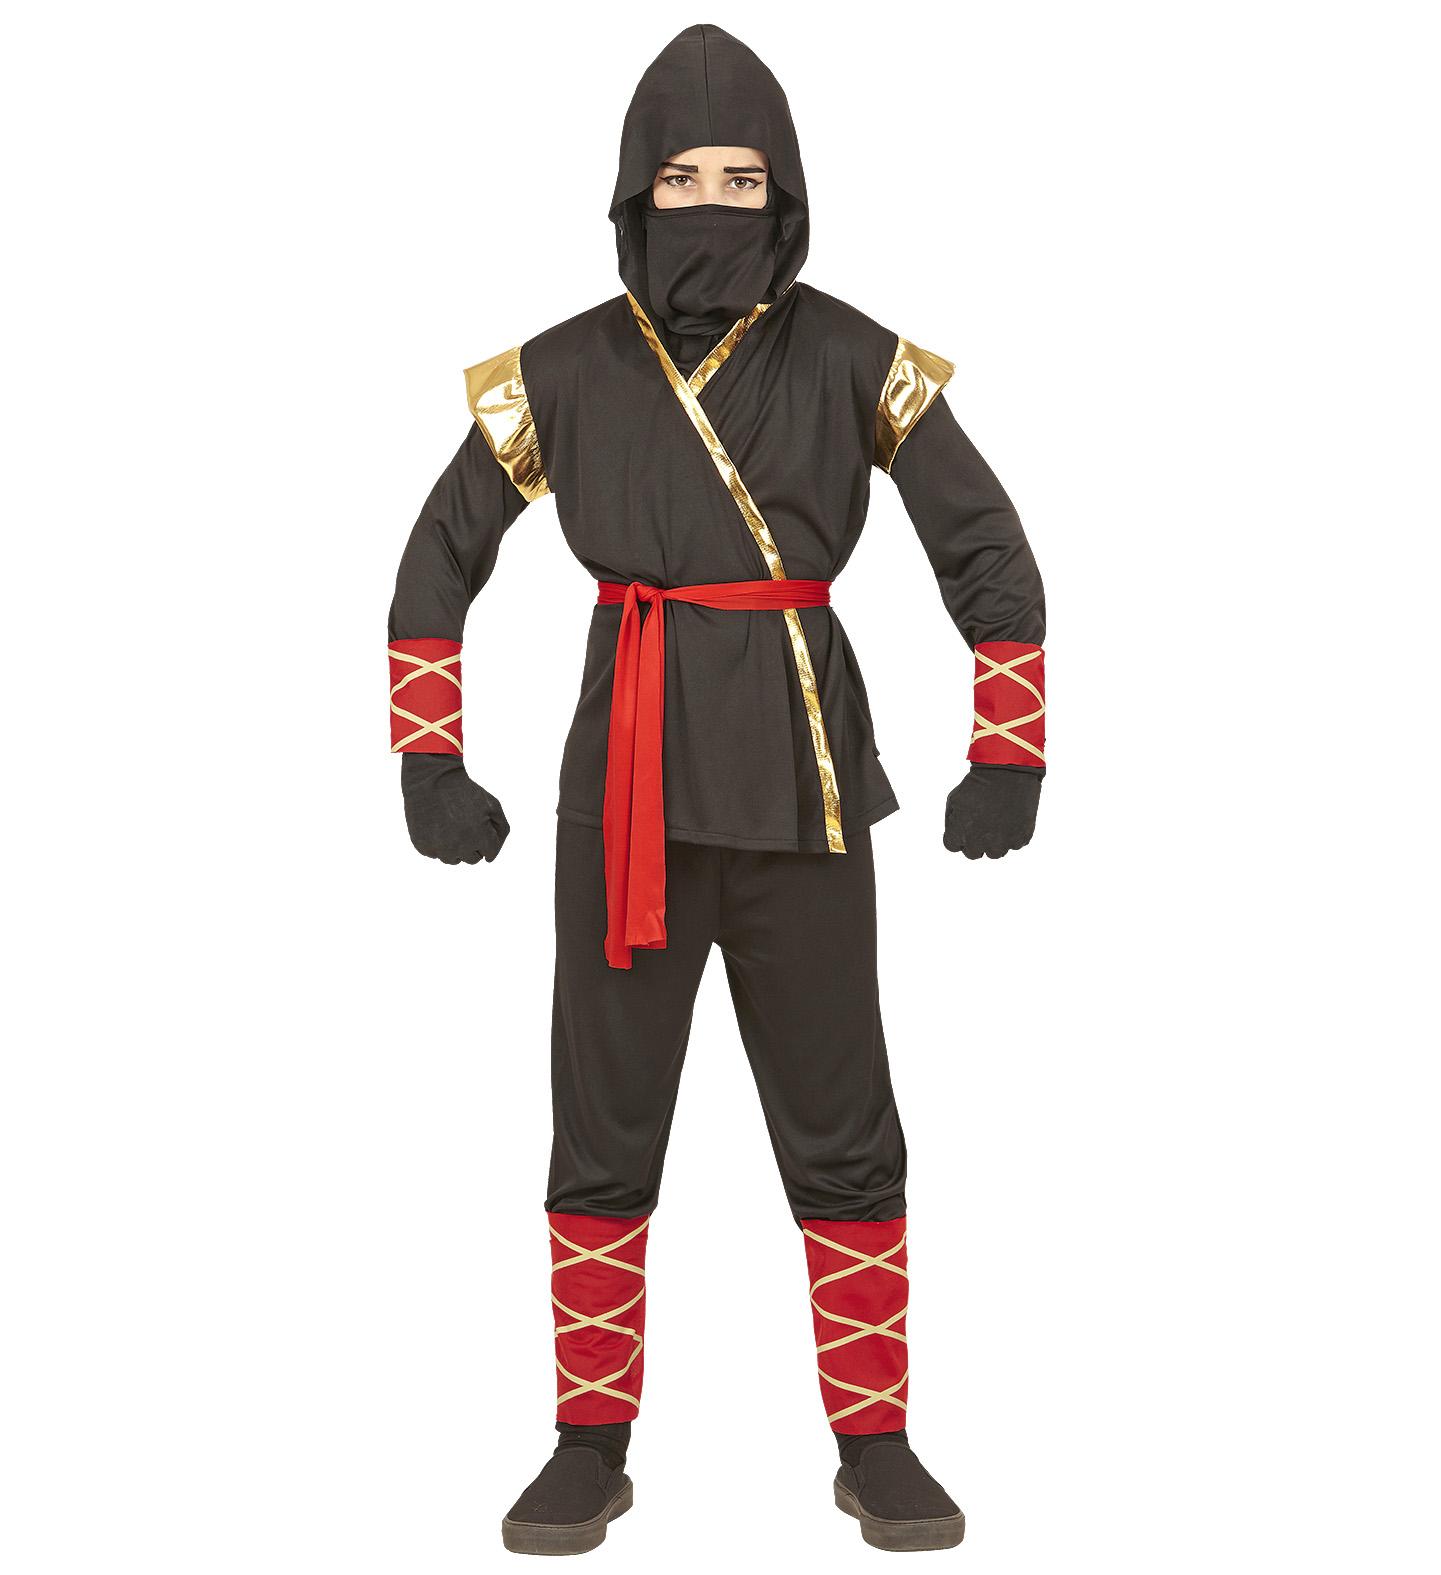 Garçons Ninja Costume Oriental Fighter Soldier Fancy Dress Outfit